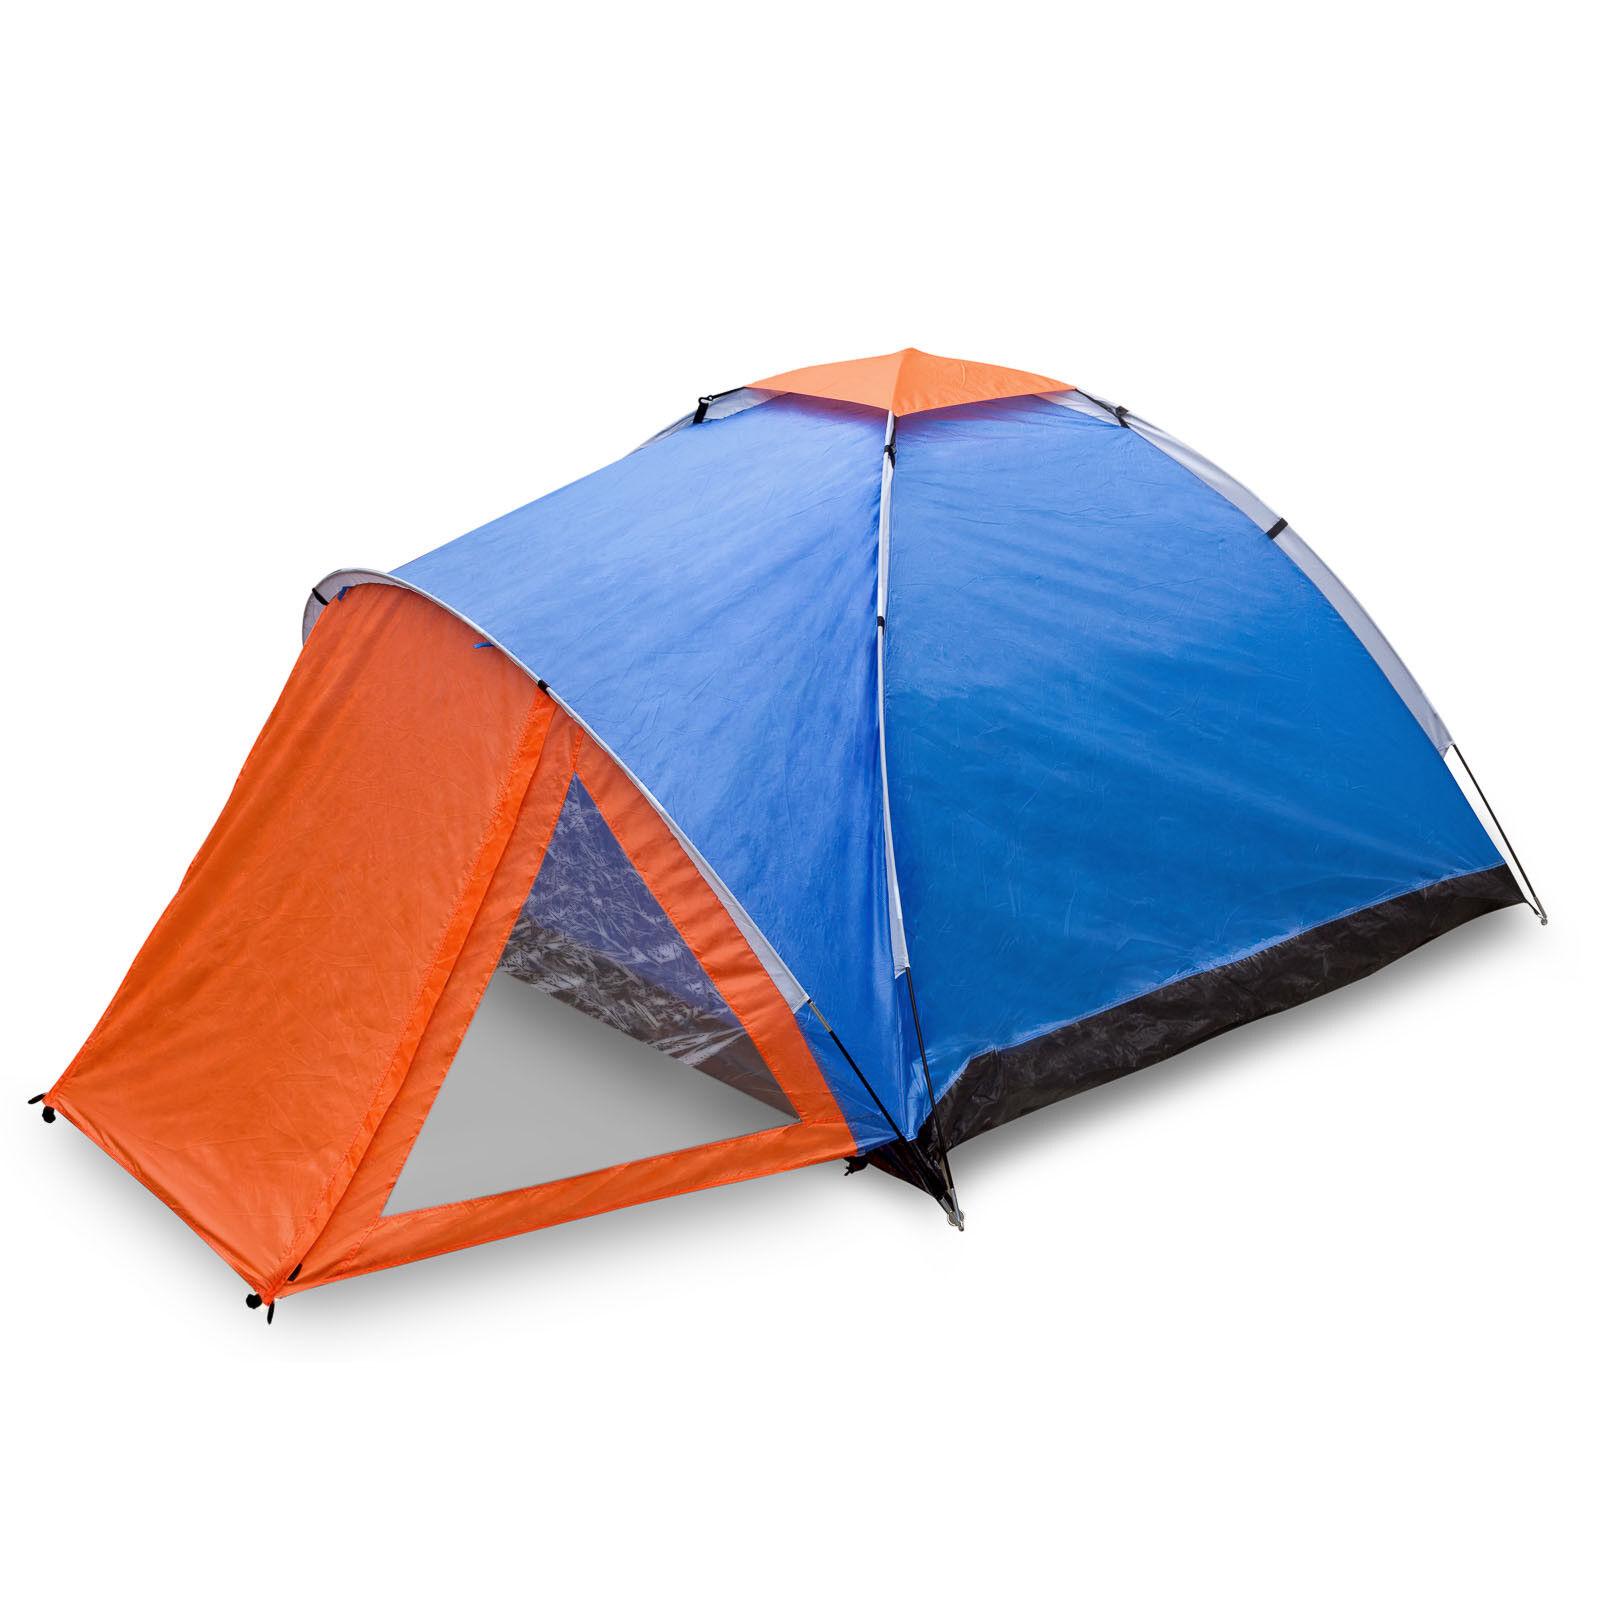 Camping Zelt Zelt Zelt für 3-4 Personen fbfeb0